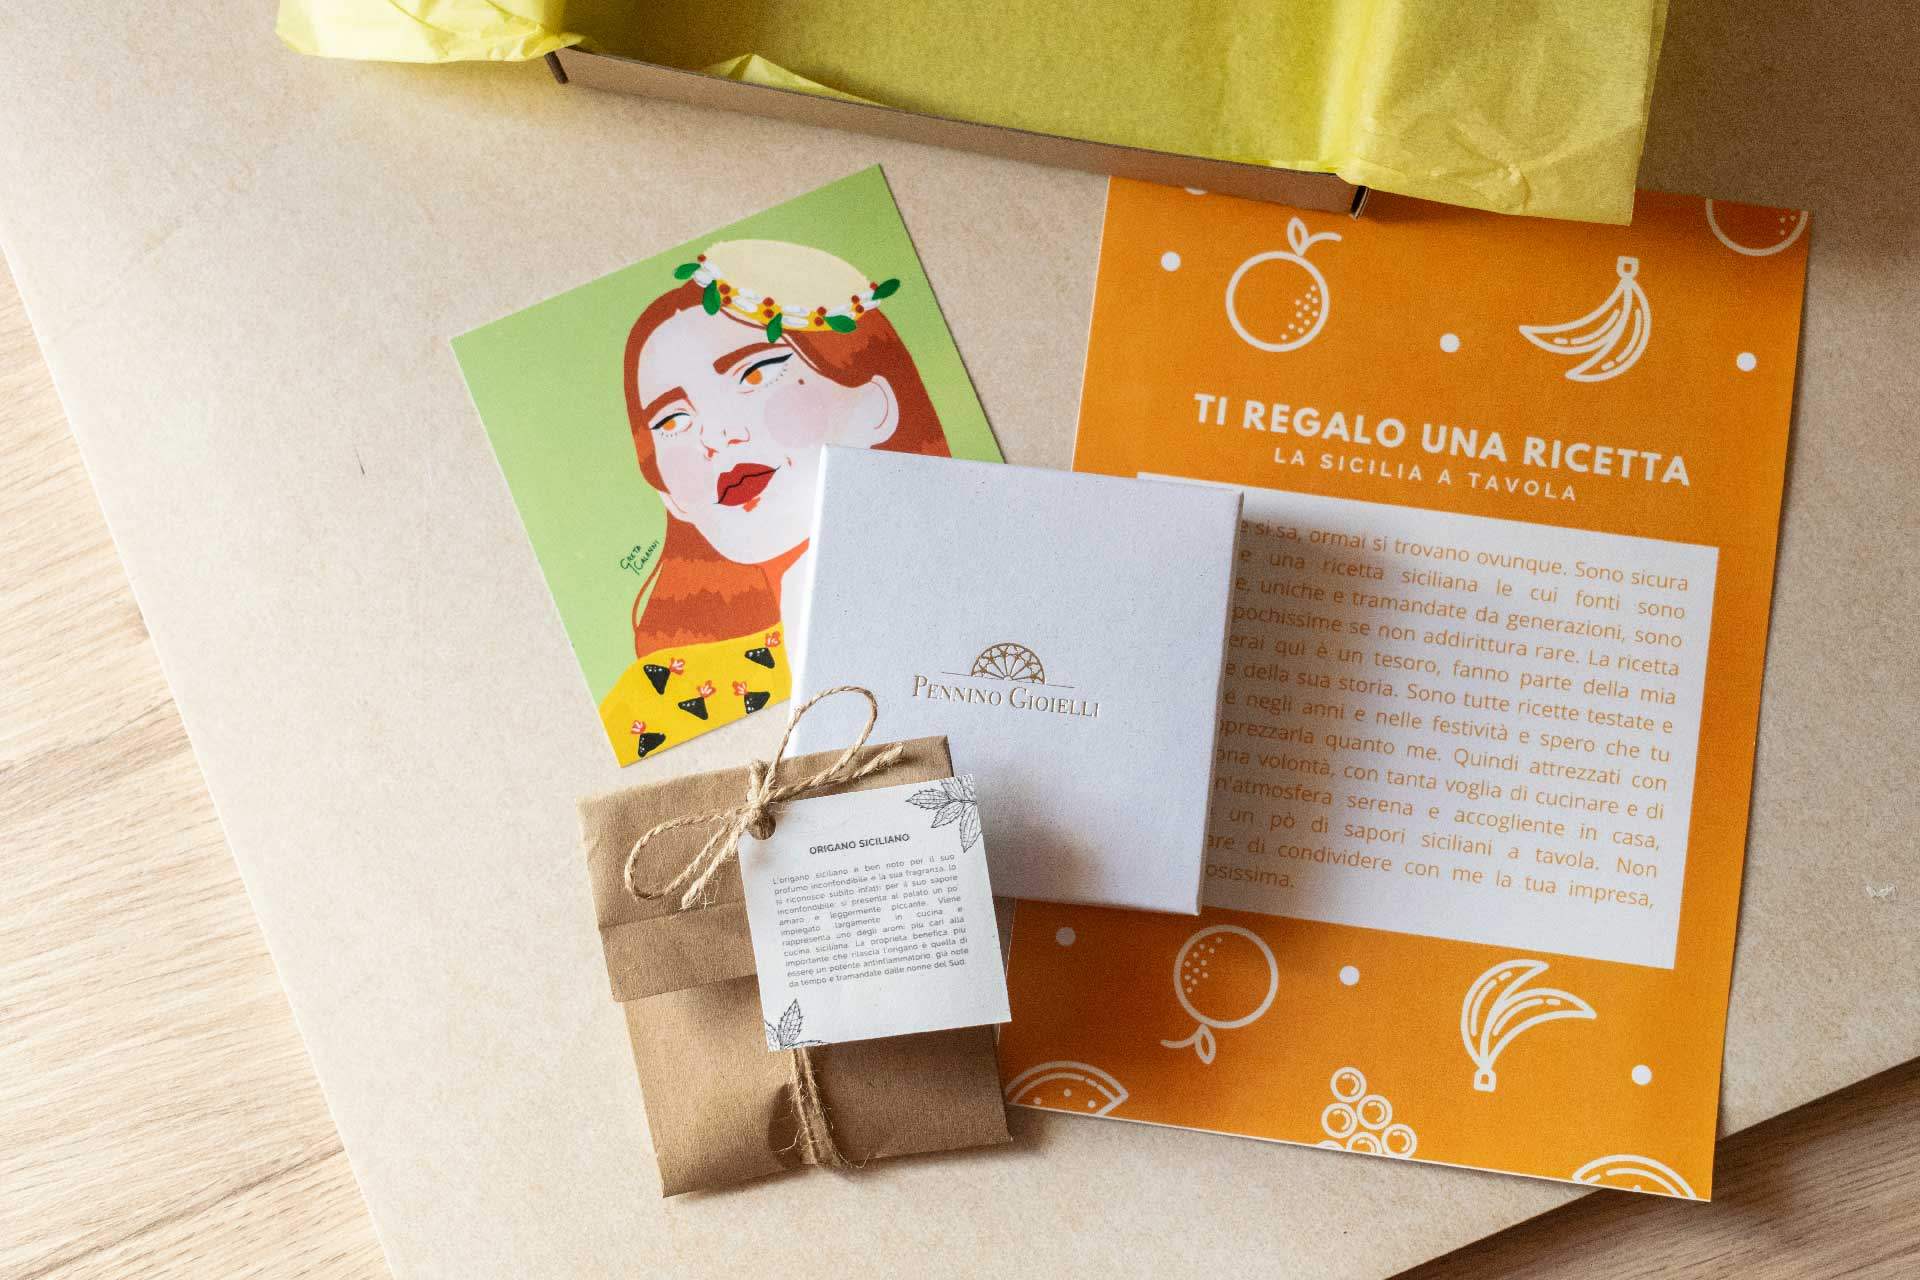 Armamè packaging, packaging regalo, packaging gioielli in ceramica, packaging creativi